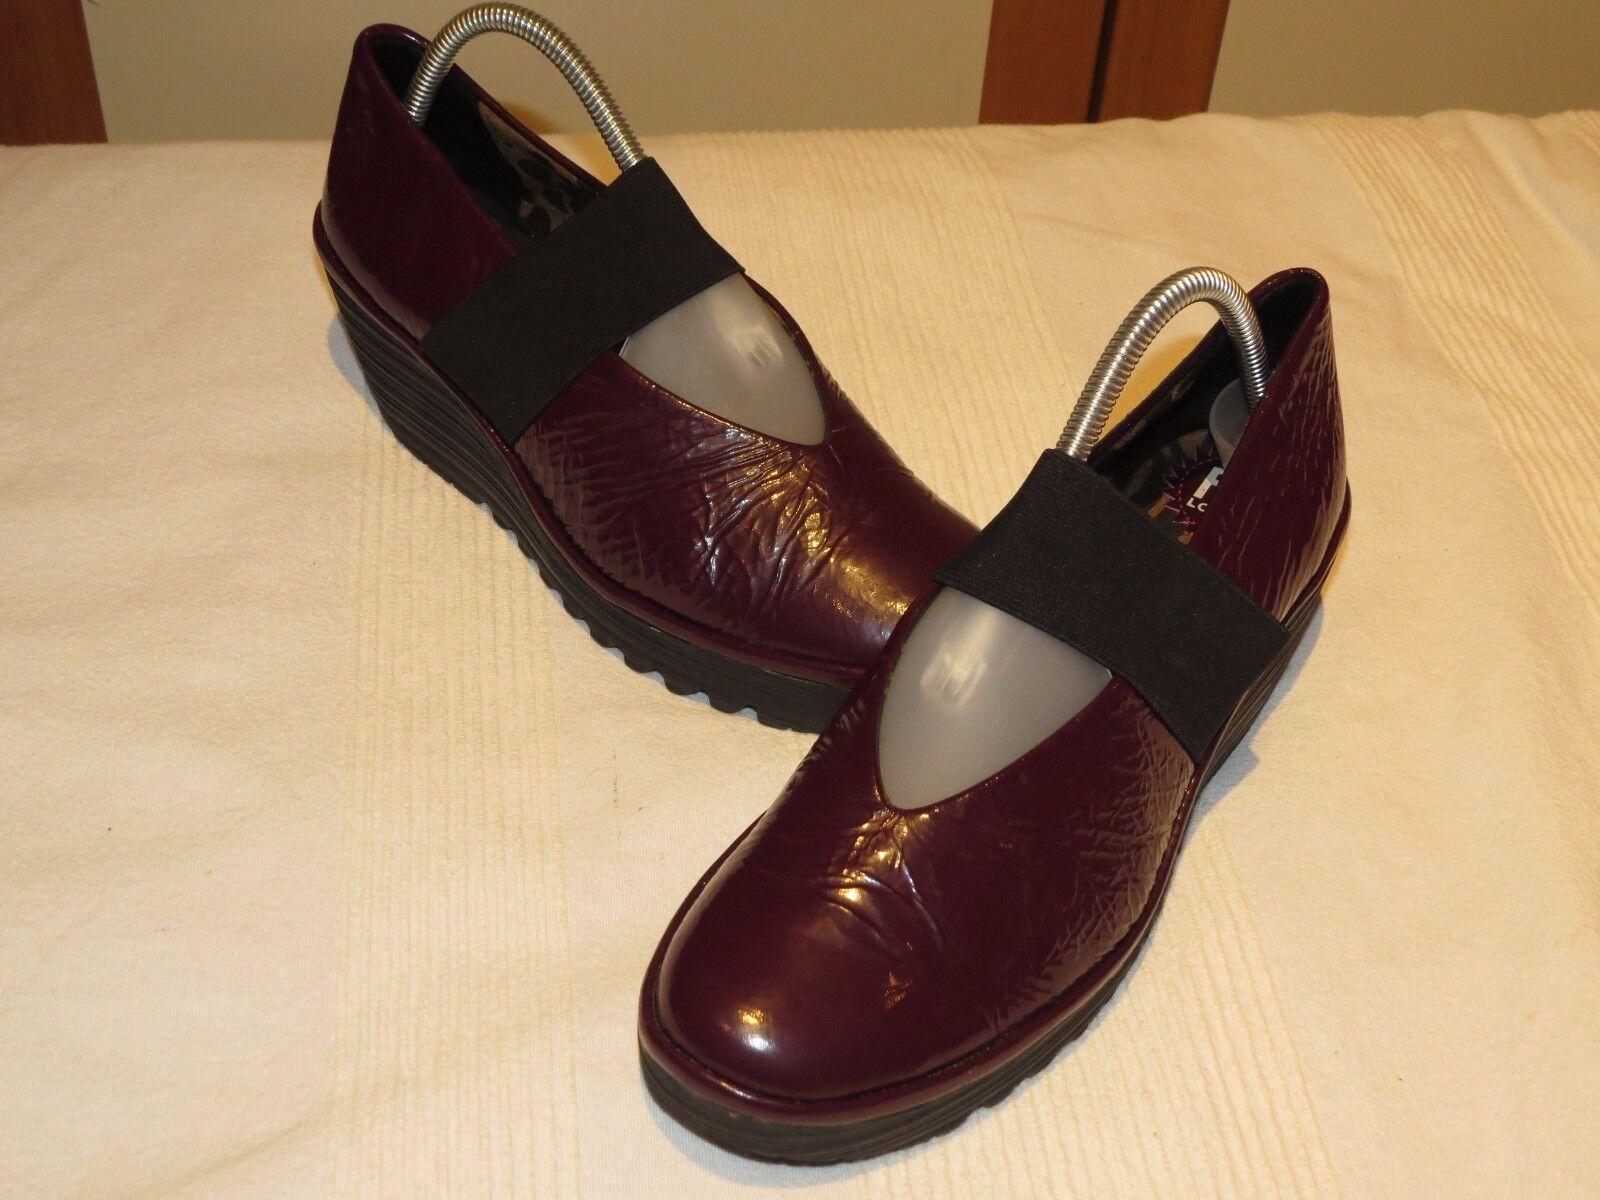 FLY LONDON YALE PURPLE PATENT LEATHER SLIP ON MARY JANE Schuhe UK 8 EU 41